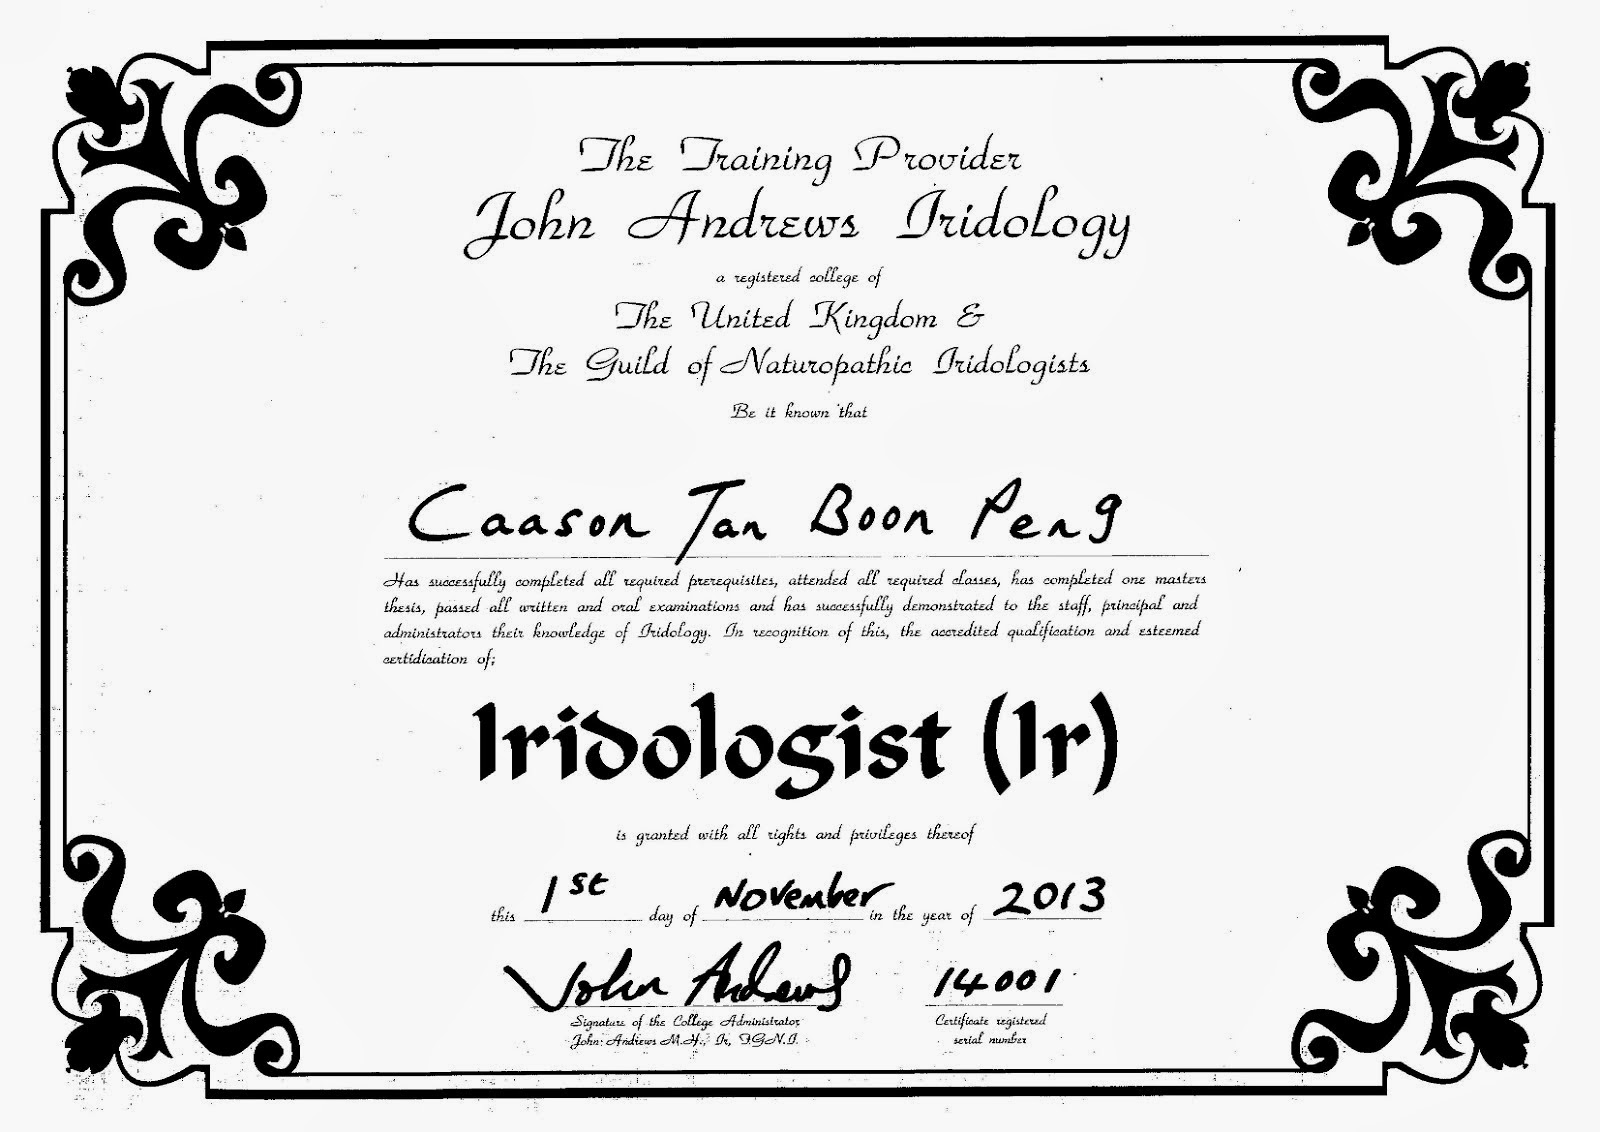 Certified Iridologist (Ir)